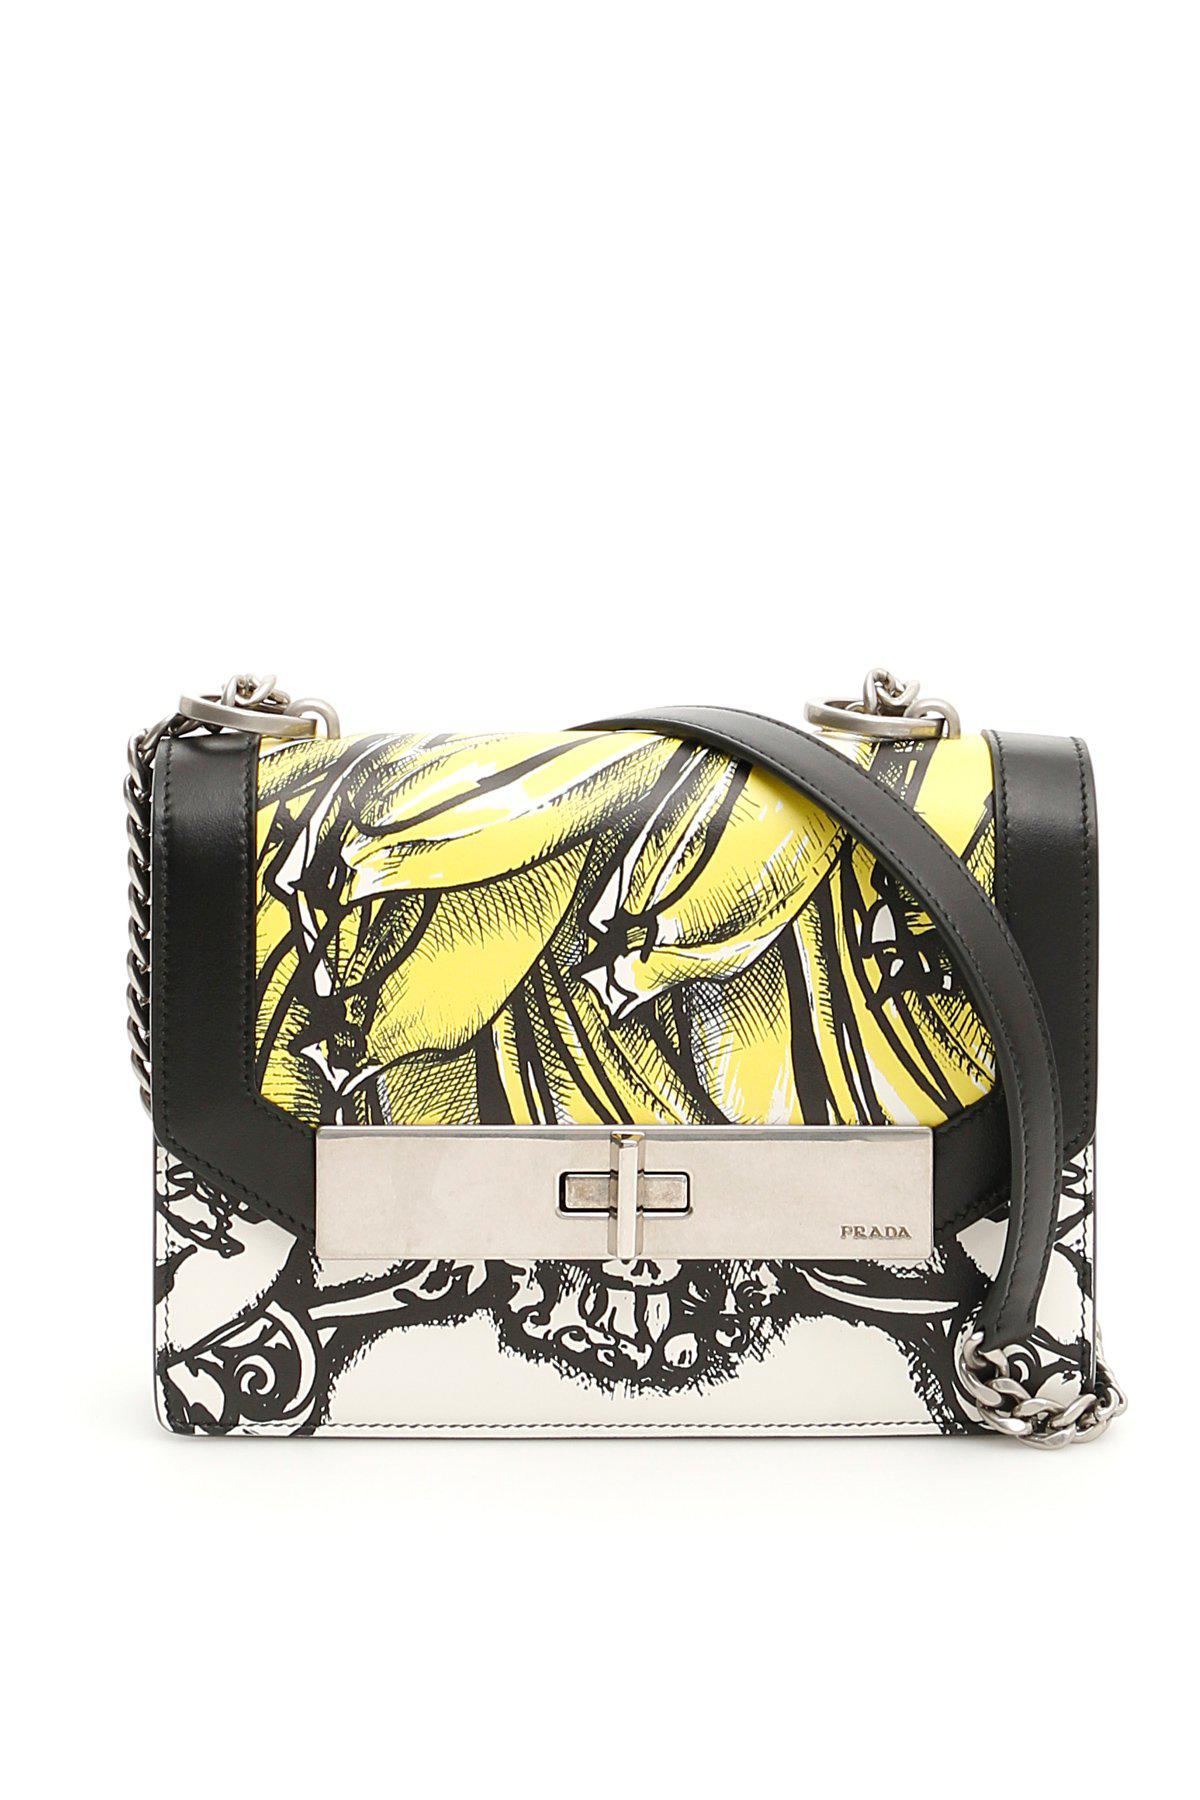 50c057febcbe35 Prada - Yellow Séverine Twist Lock Shoulder Bag - Lyst. View fullscreen